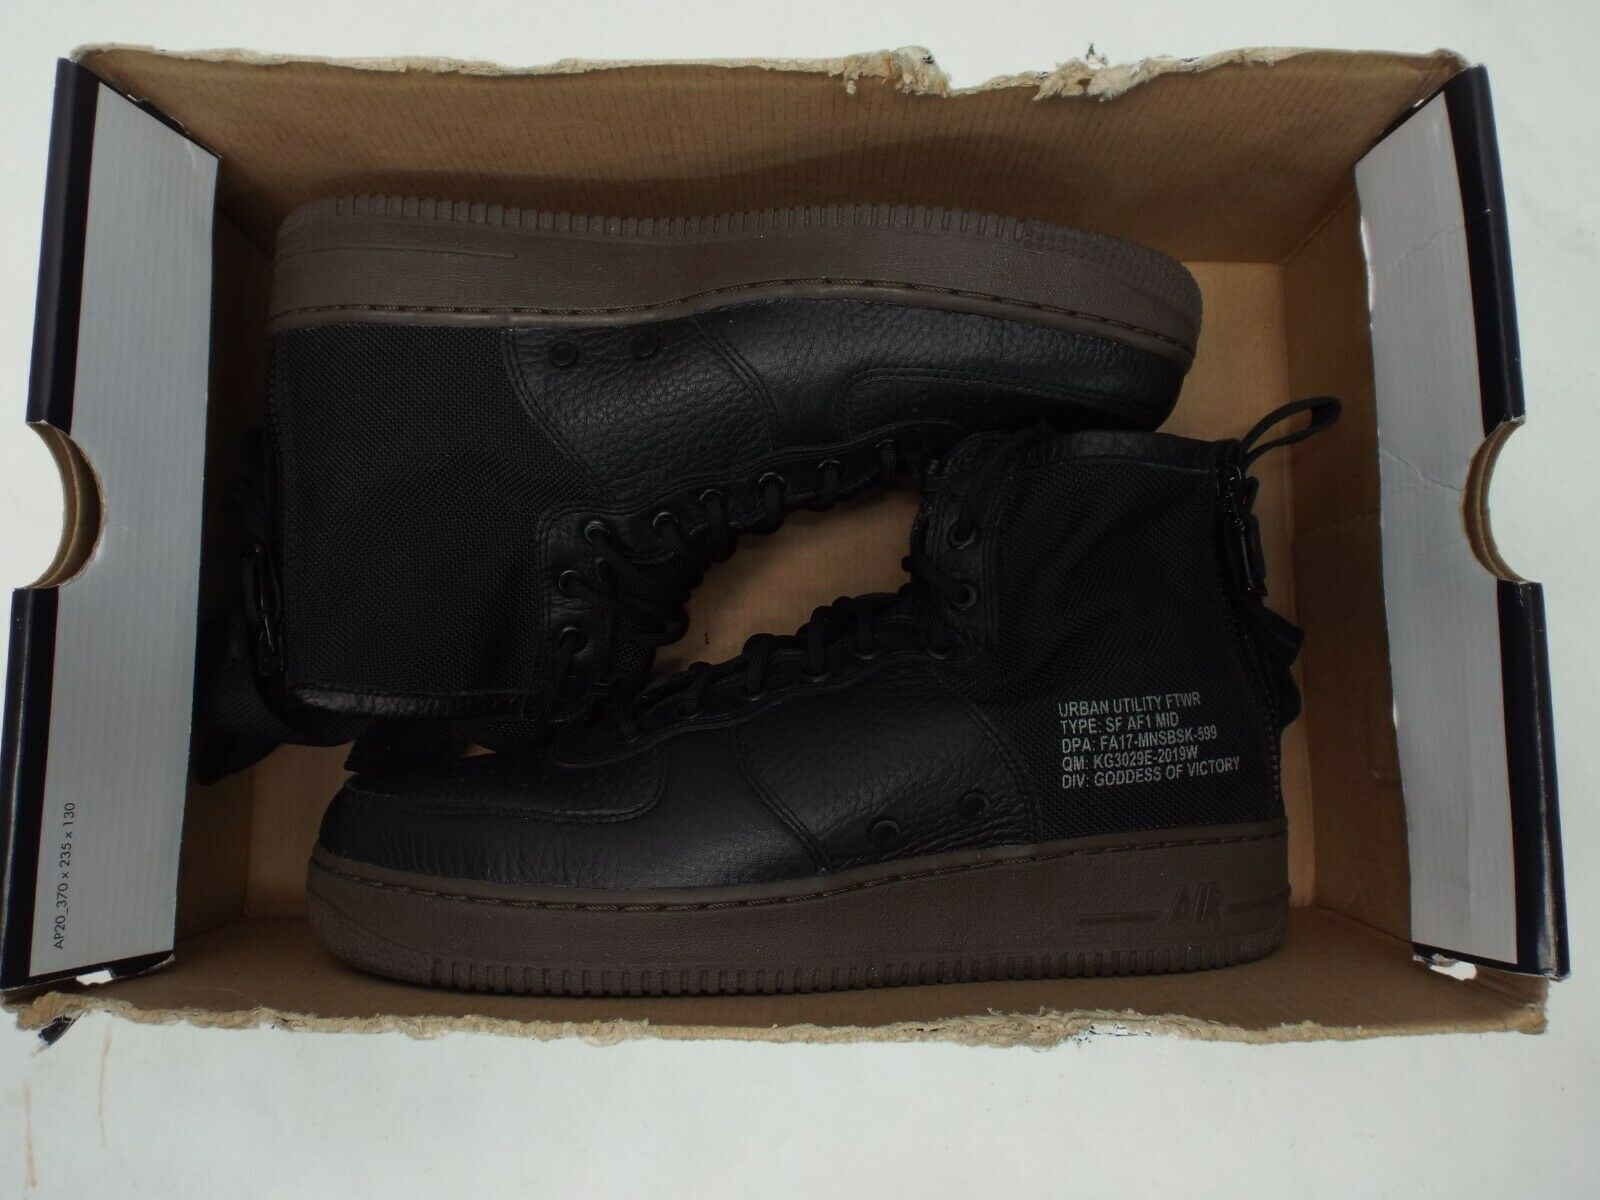 New Mens Mens Mens 10.5 NIKE SF AF1 Mid Military Boots Black Hazel shoes  160 917753-002 da7503